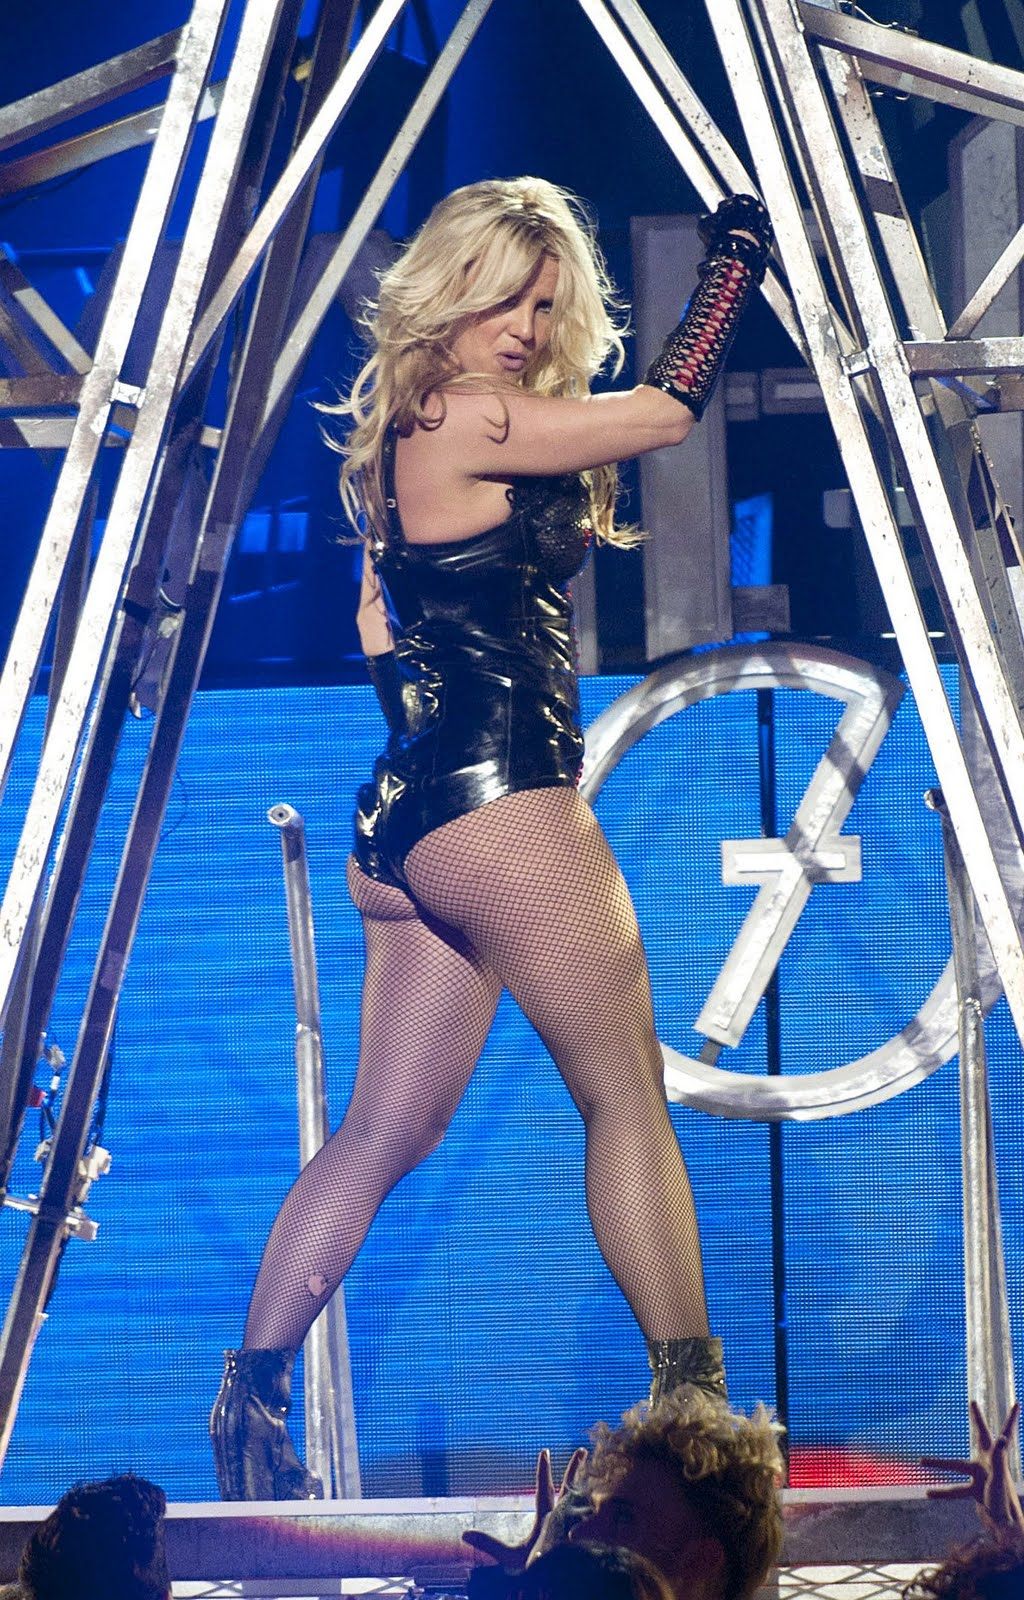 http://1.bp.blogspot.com/-lMOkODO11uY/ThZuXnxkA3I/AAAAAAAAFVM/20hpbwjWm1c/s1600/Britney+Spears-femme+fatale-circus-ooops+i+did+it+gain-pics-Britney+Spears+2011-+%25283%2529.jpg